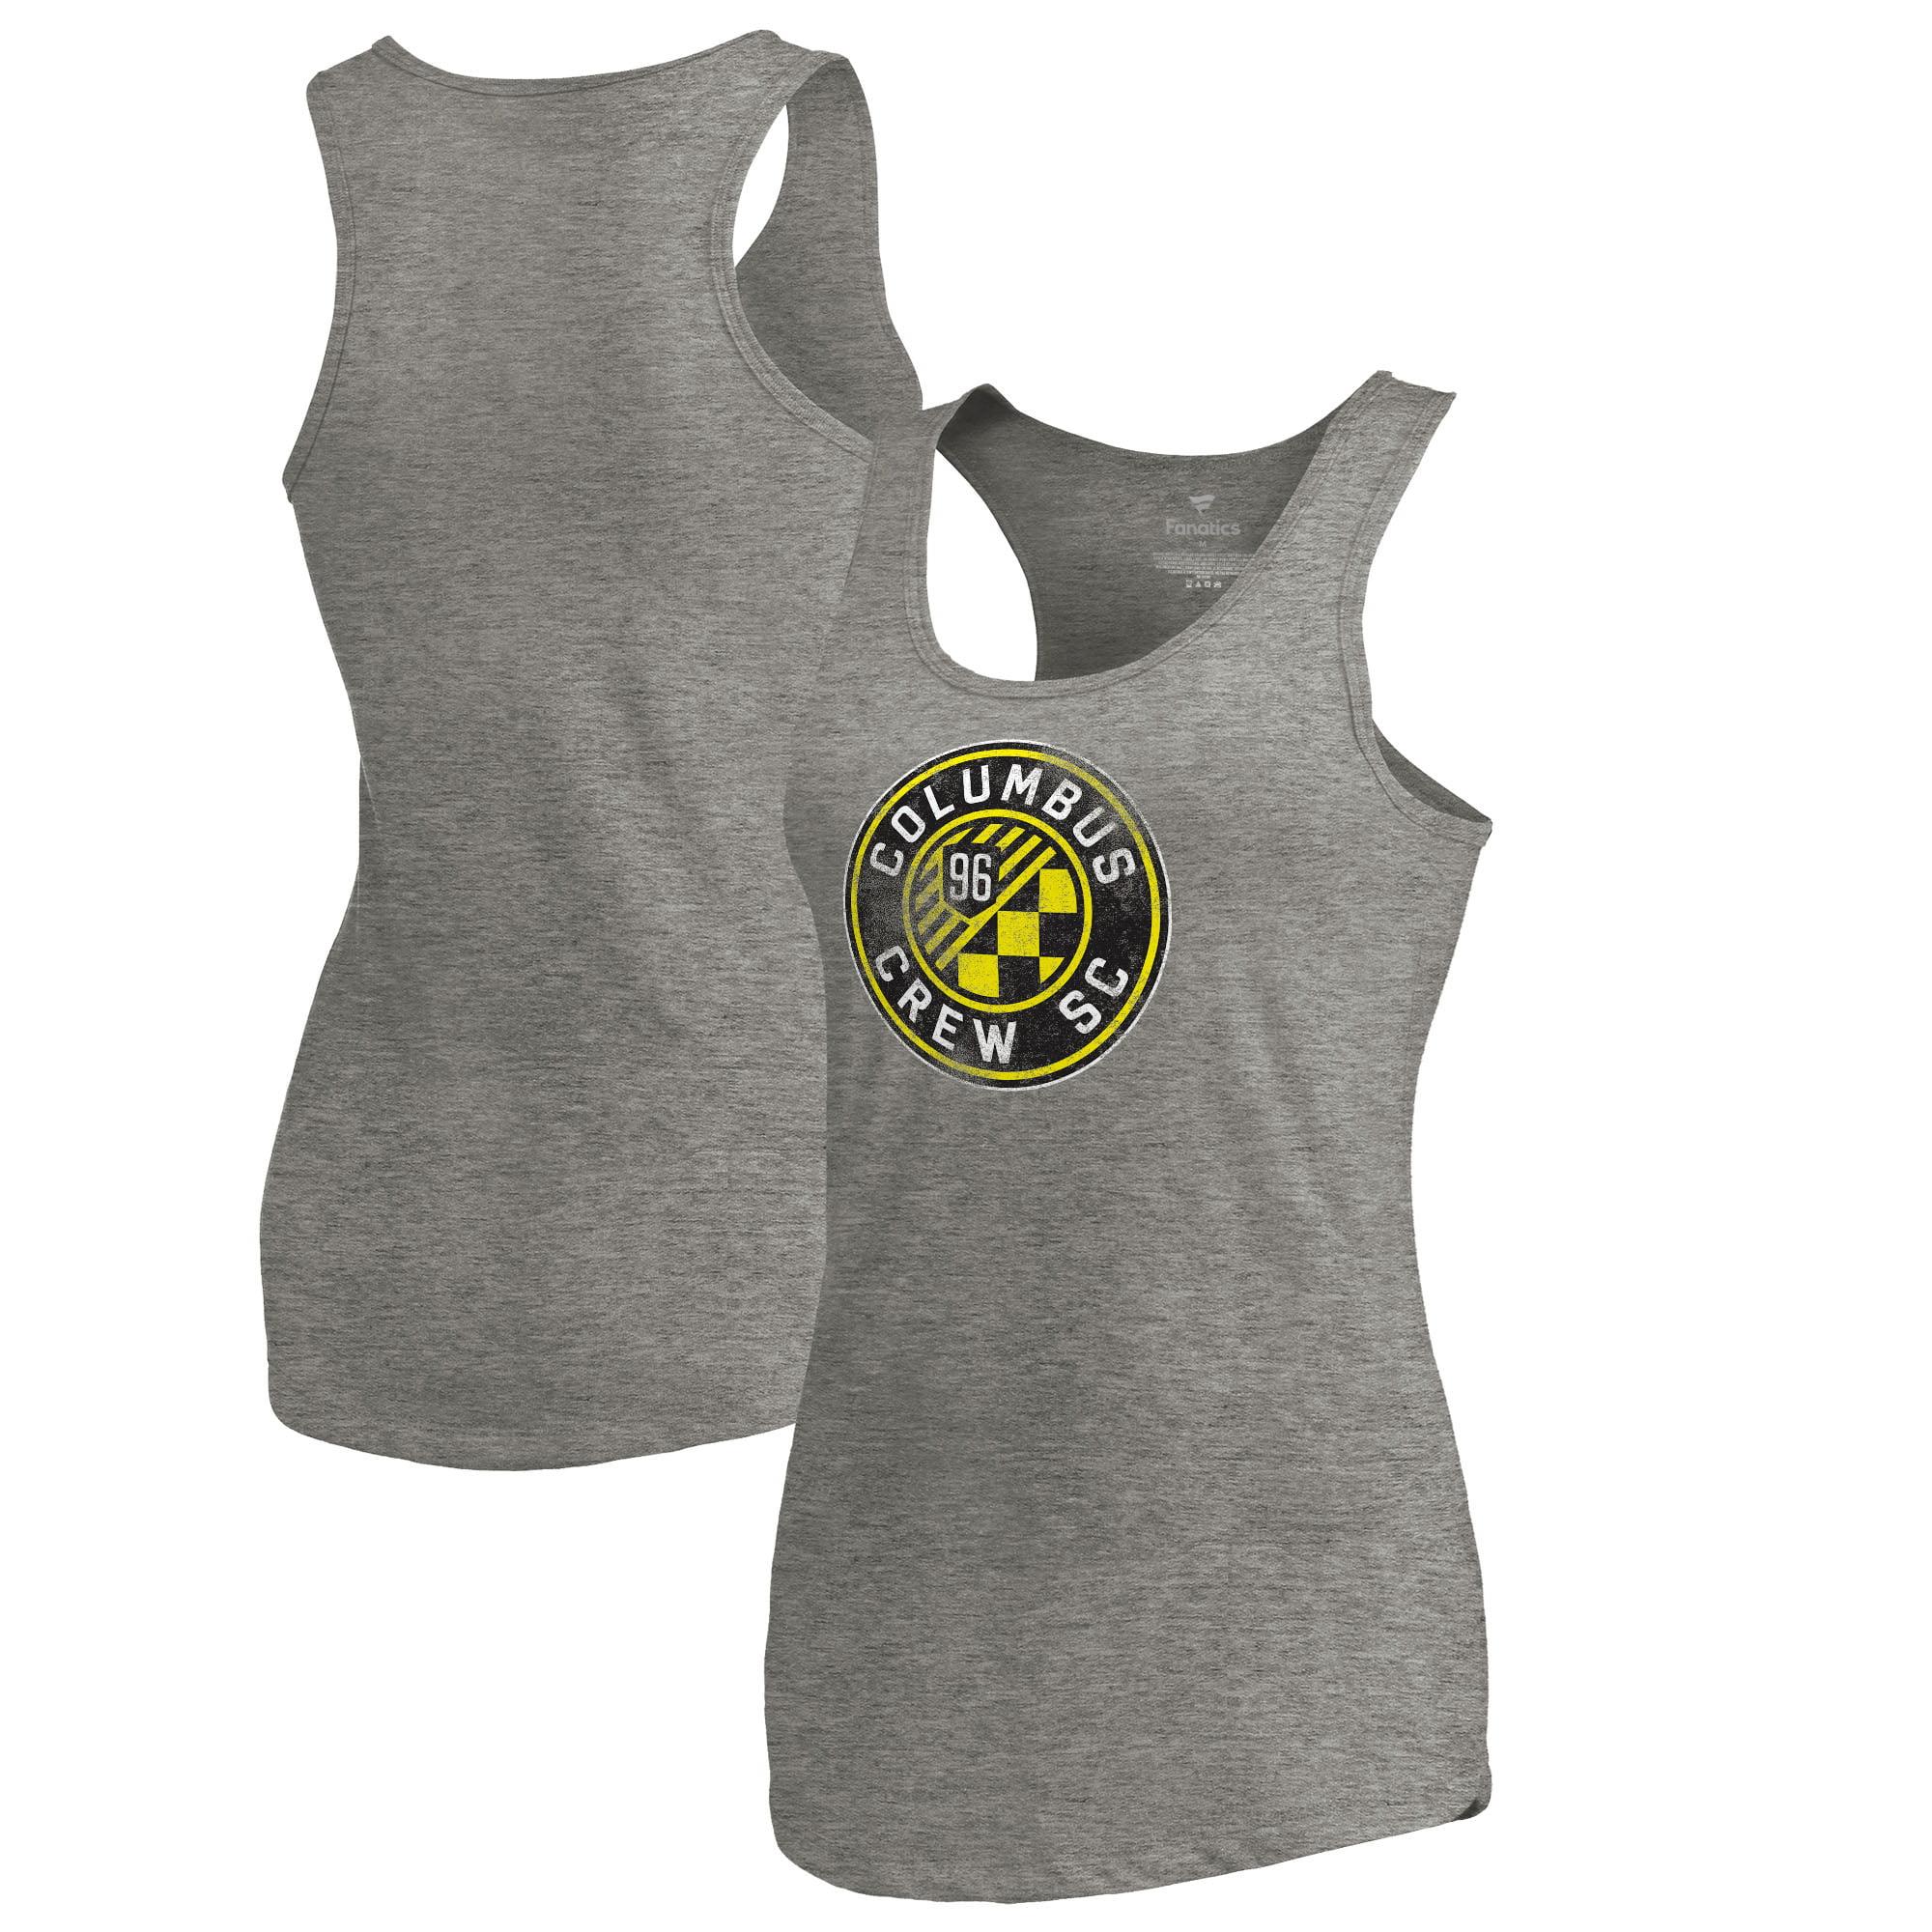 Columbus Crew SC Fanatics Branded Women's Distressed Primary Logo Tri-Blend Tank Top - Heathered Gray